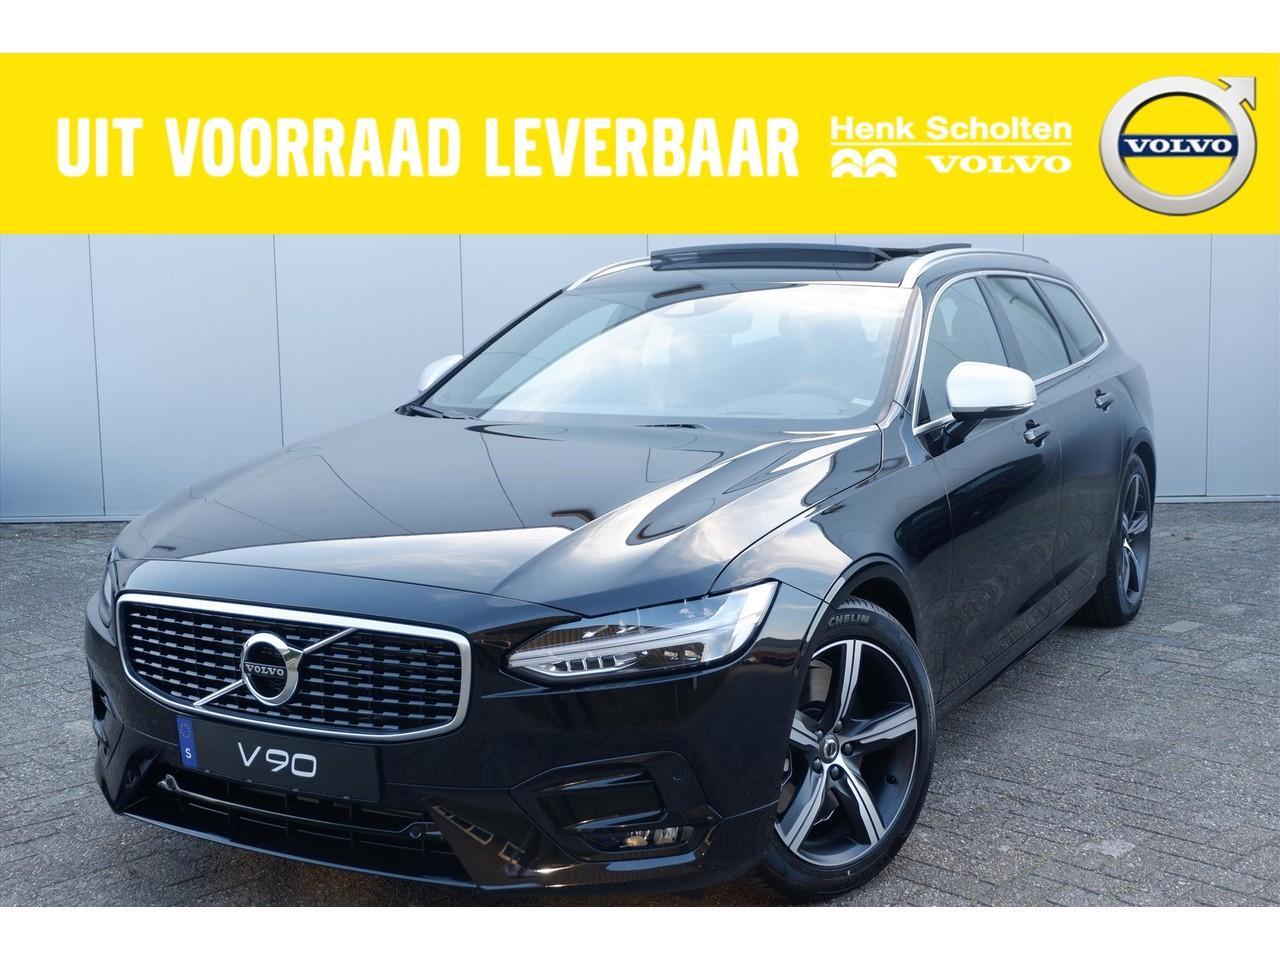 Volvo V90 T4 190pk aut8 business sport/luxury/scandi.